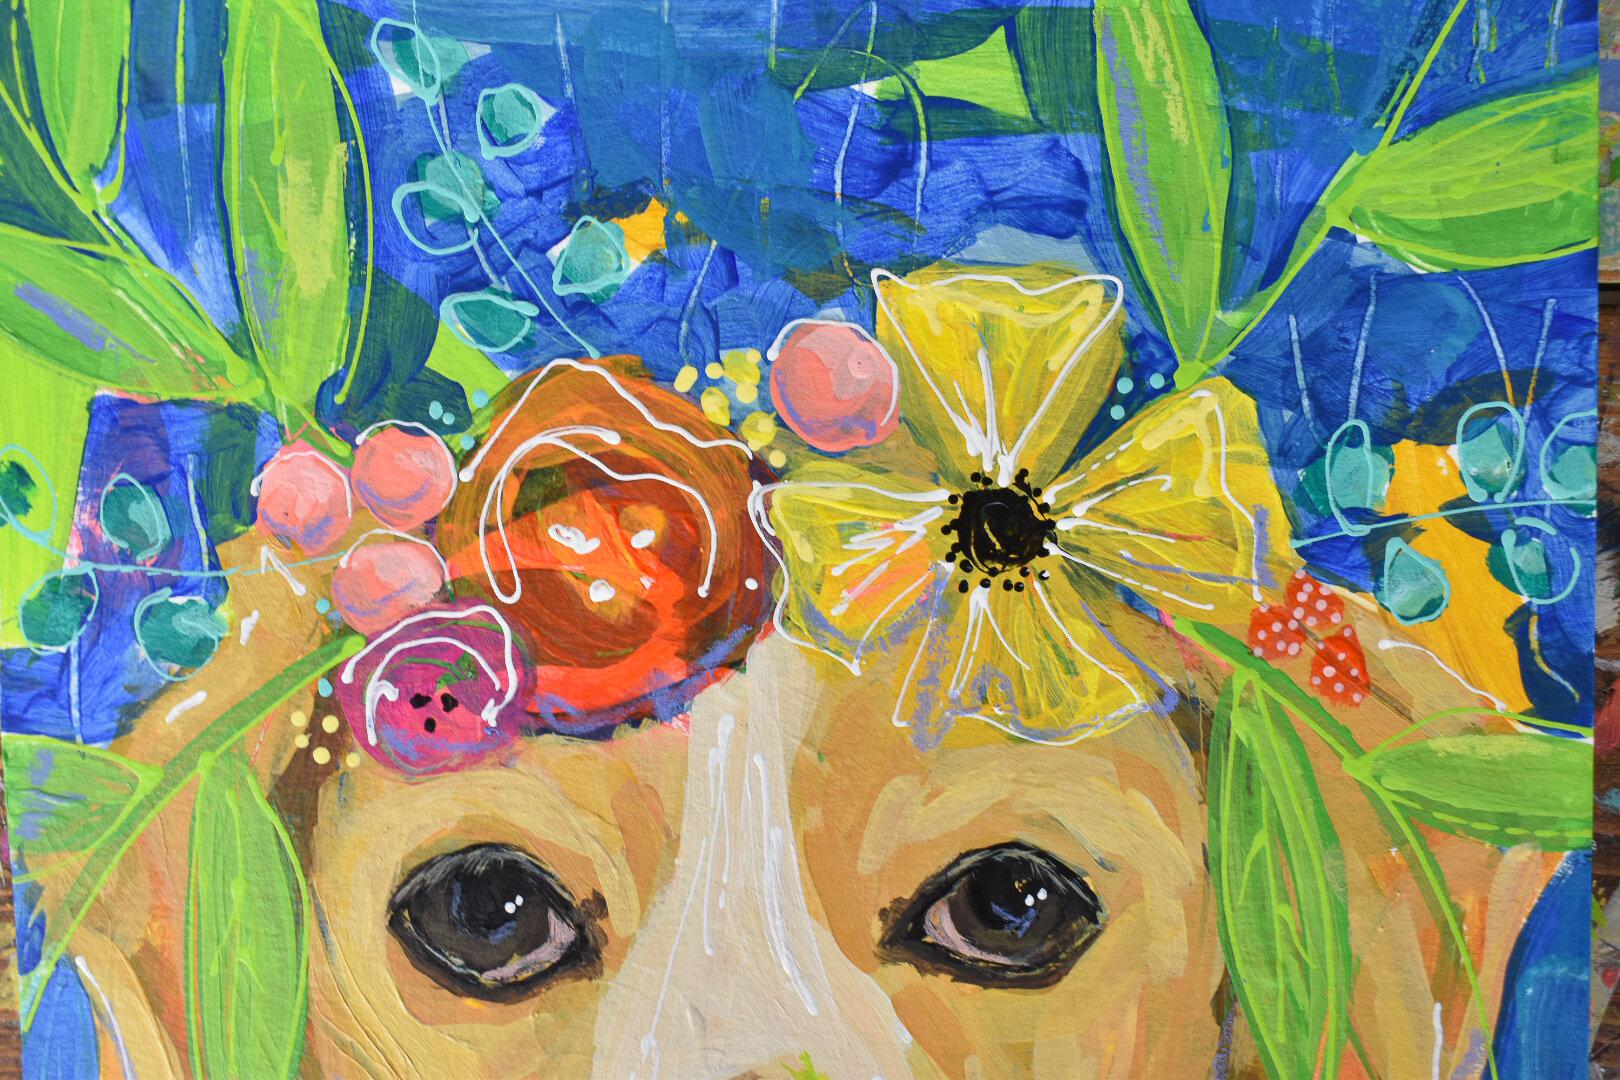 boho_yellowlabrador_flowercrown_daisyfaithart6.jpg